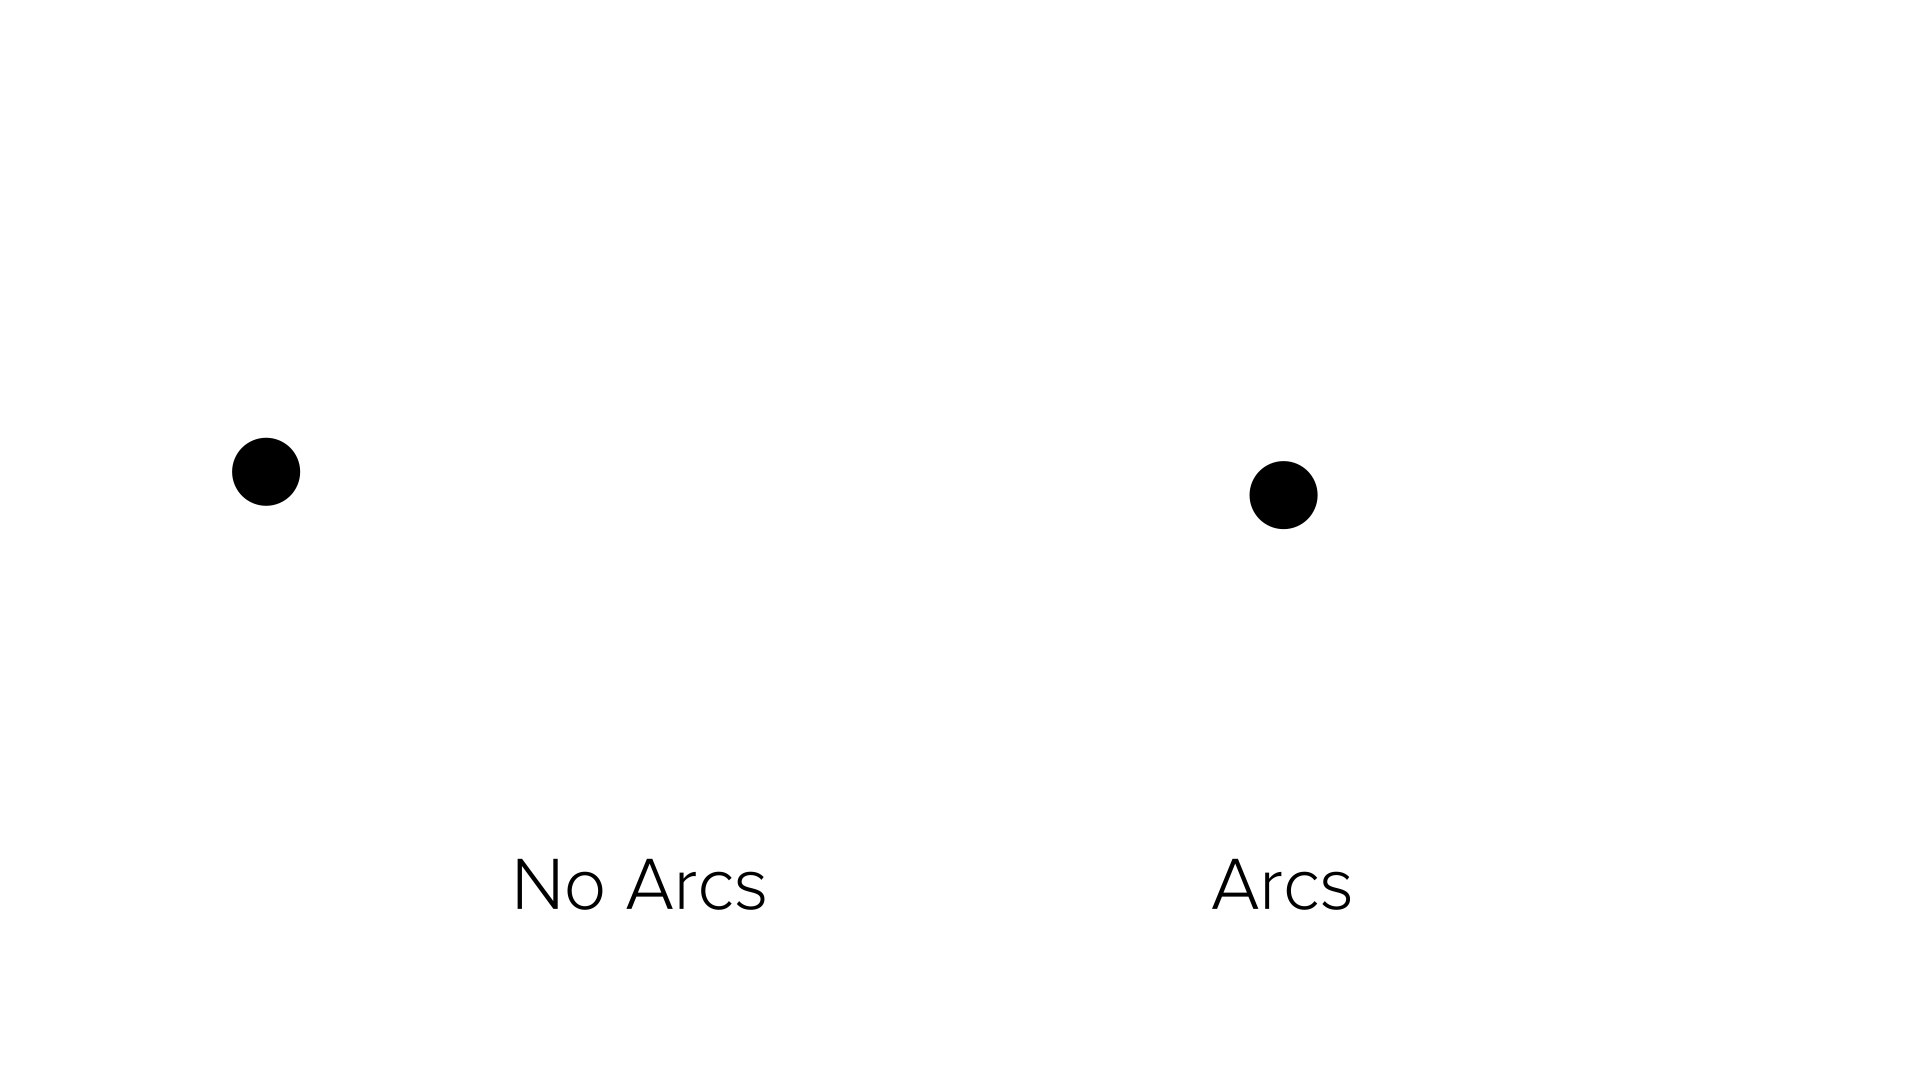 5-Principles-Motion-Design-Arcs-VMG-Studios